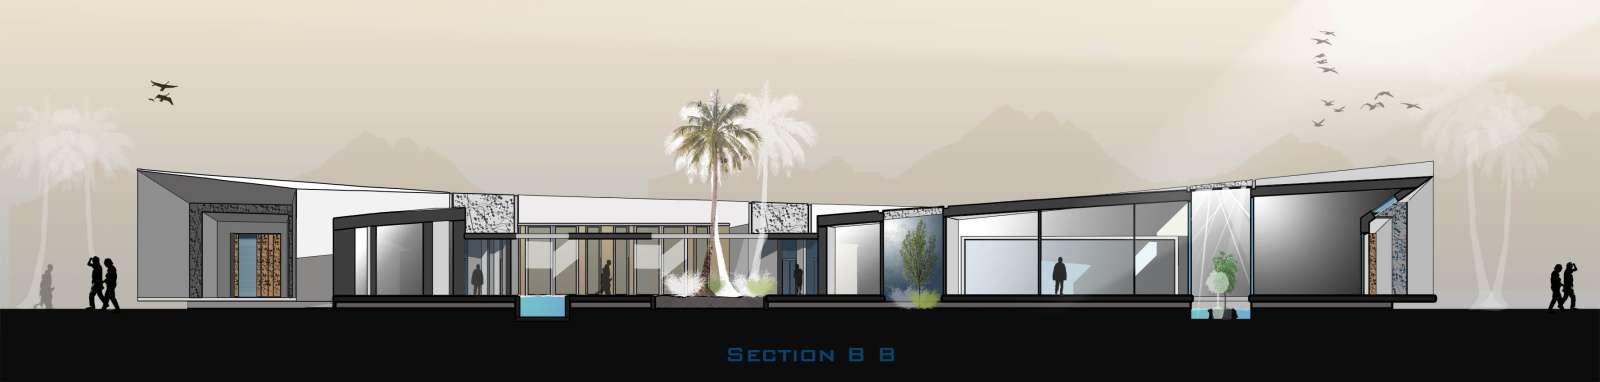 12-Alkhozama-Desert-Casa-de-Ark-Kassam-Arquitectos